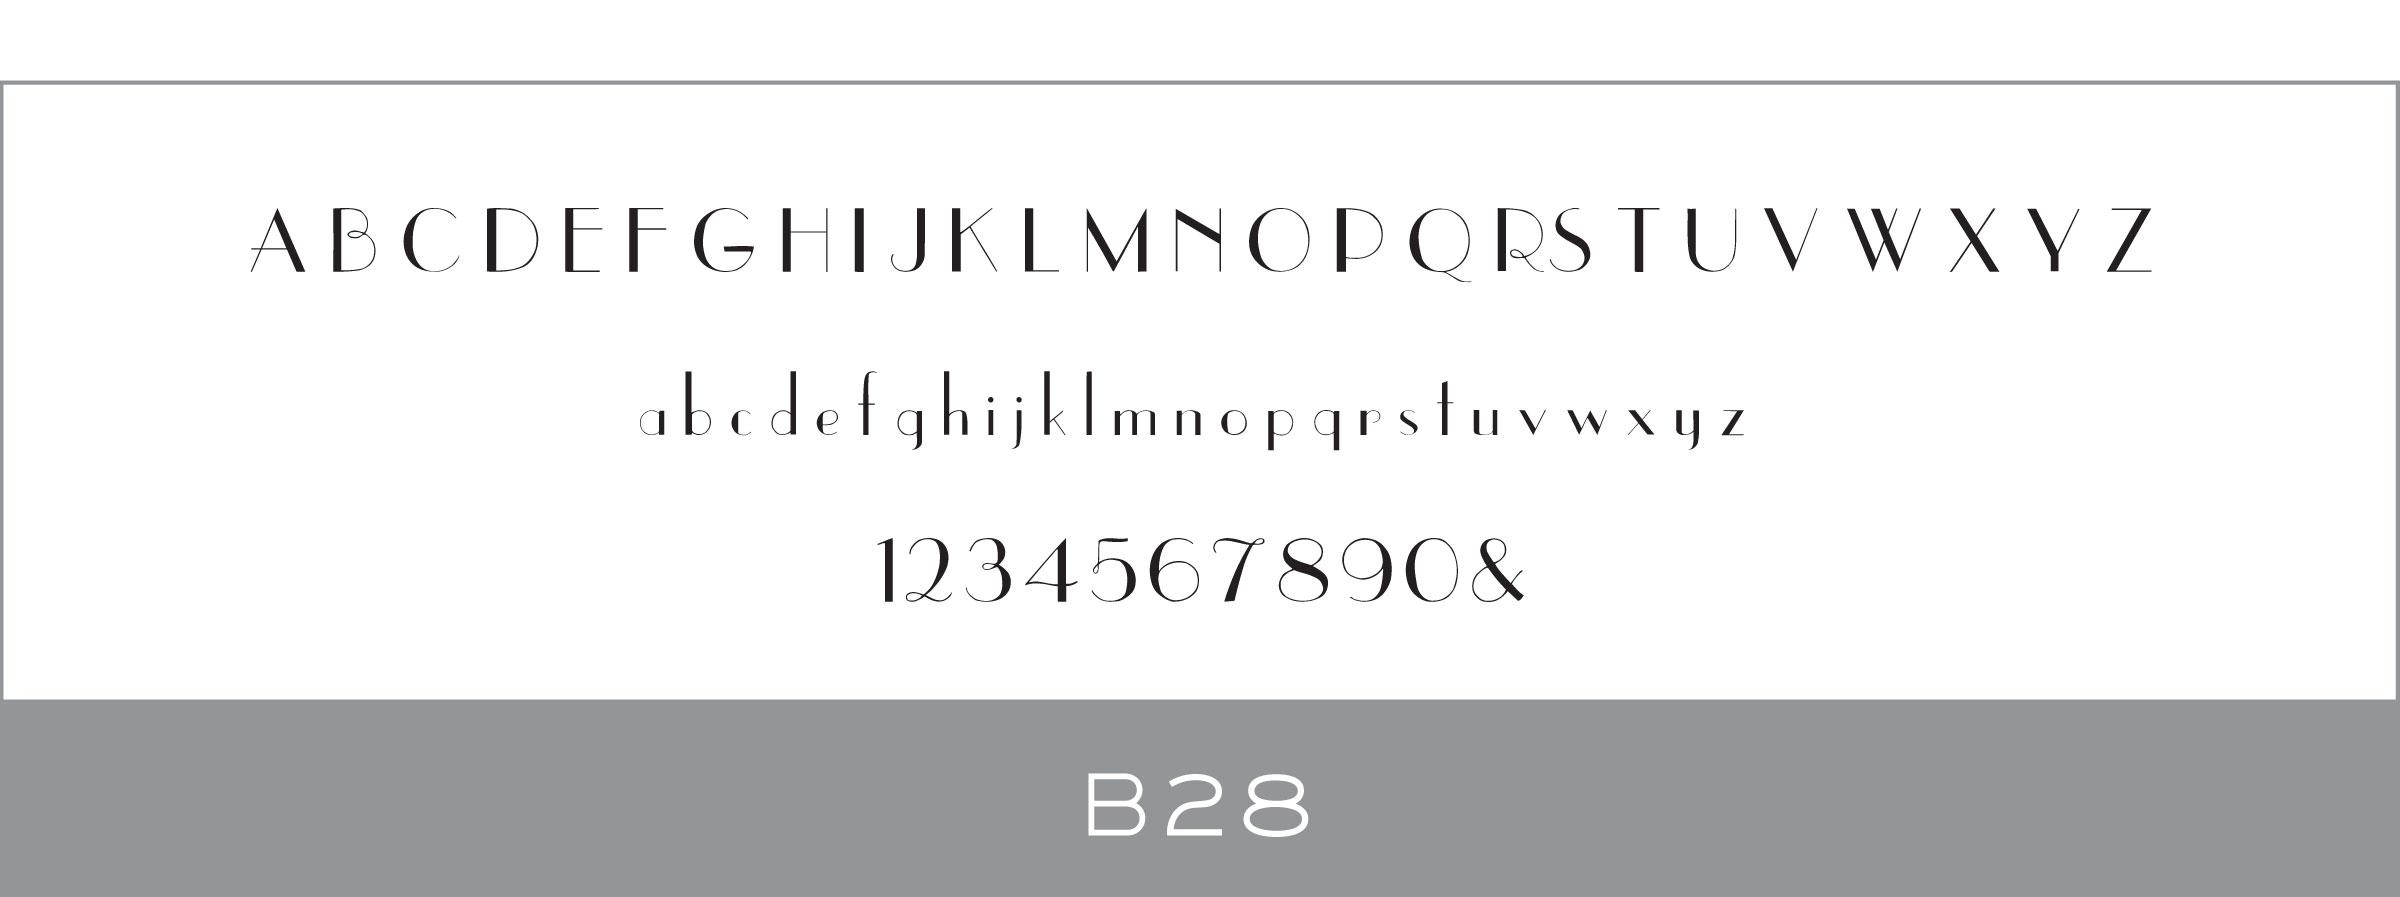 B28_Haute_Papier_Font.jpg